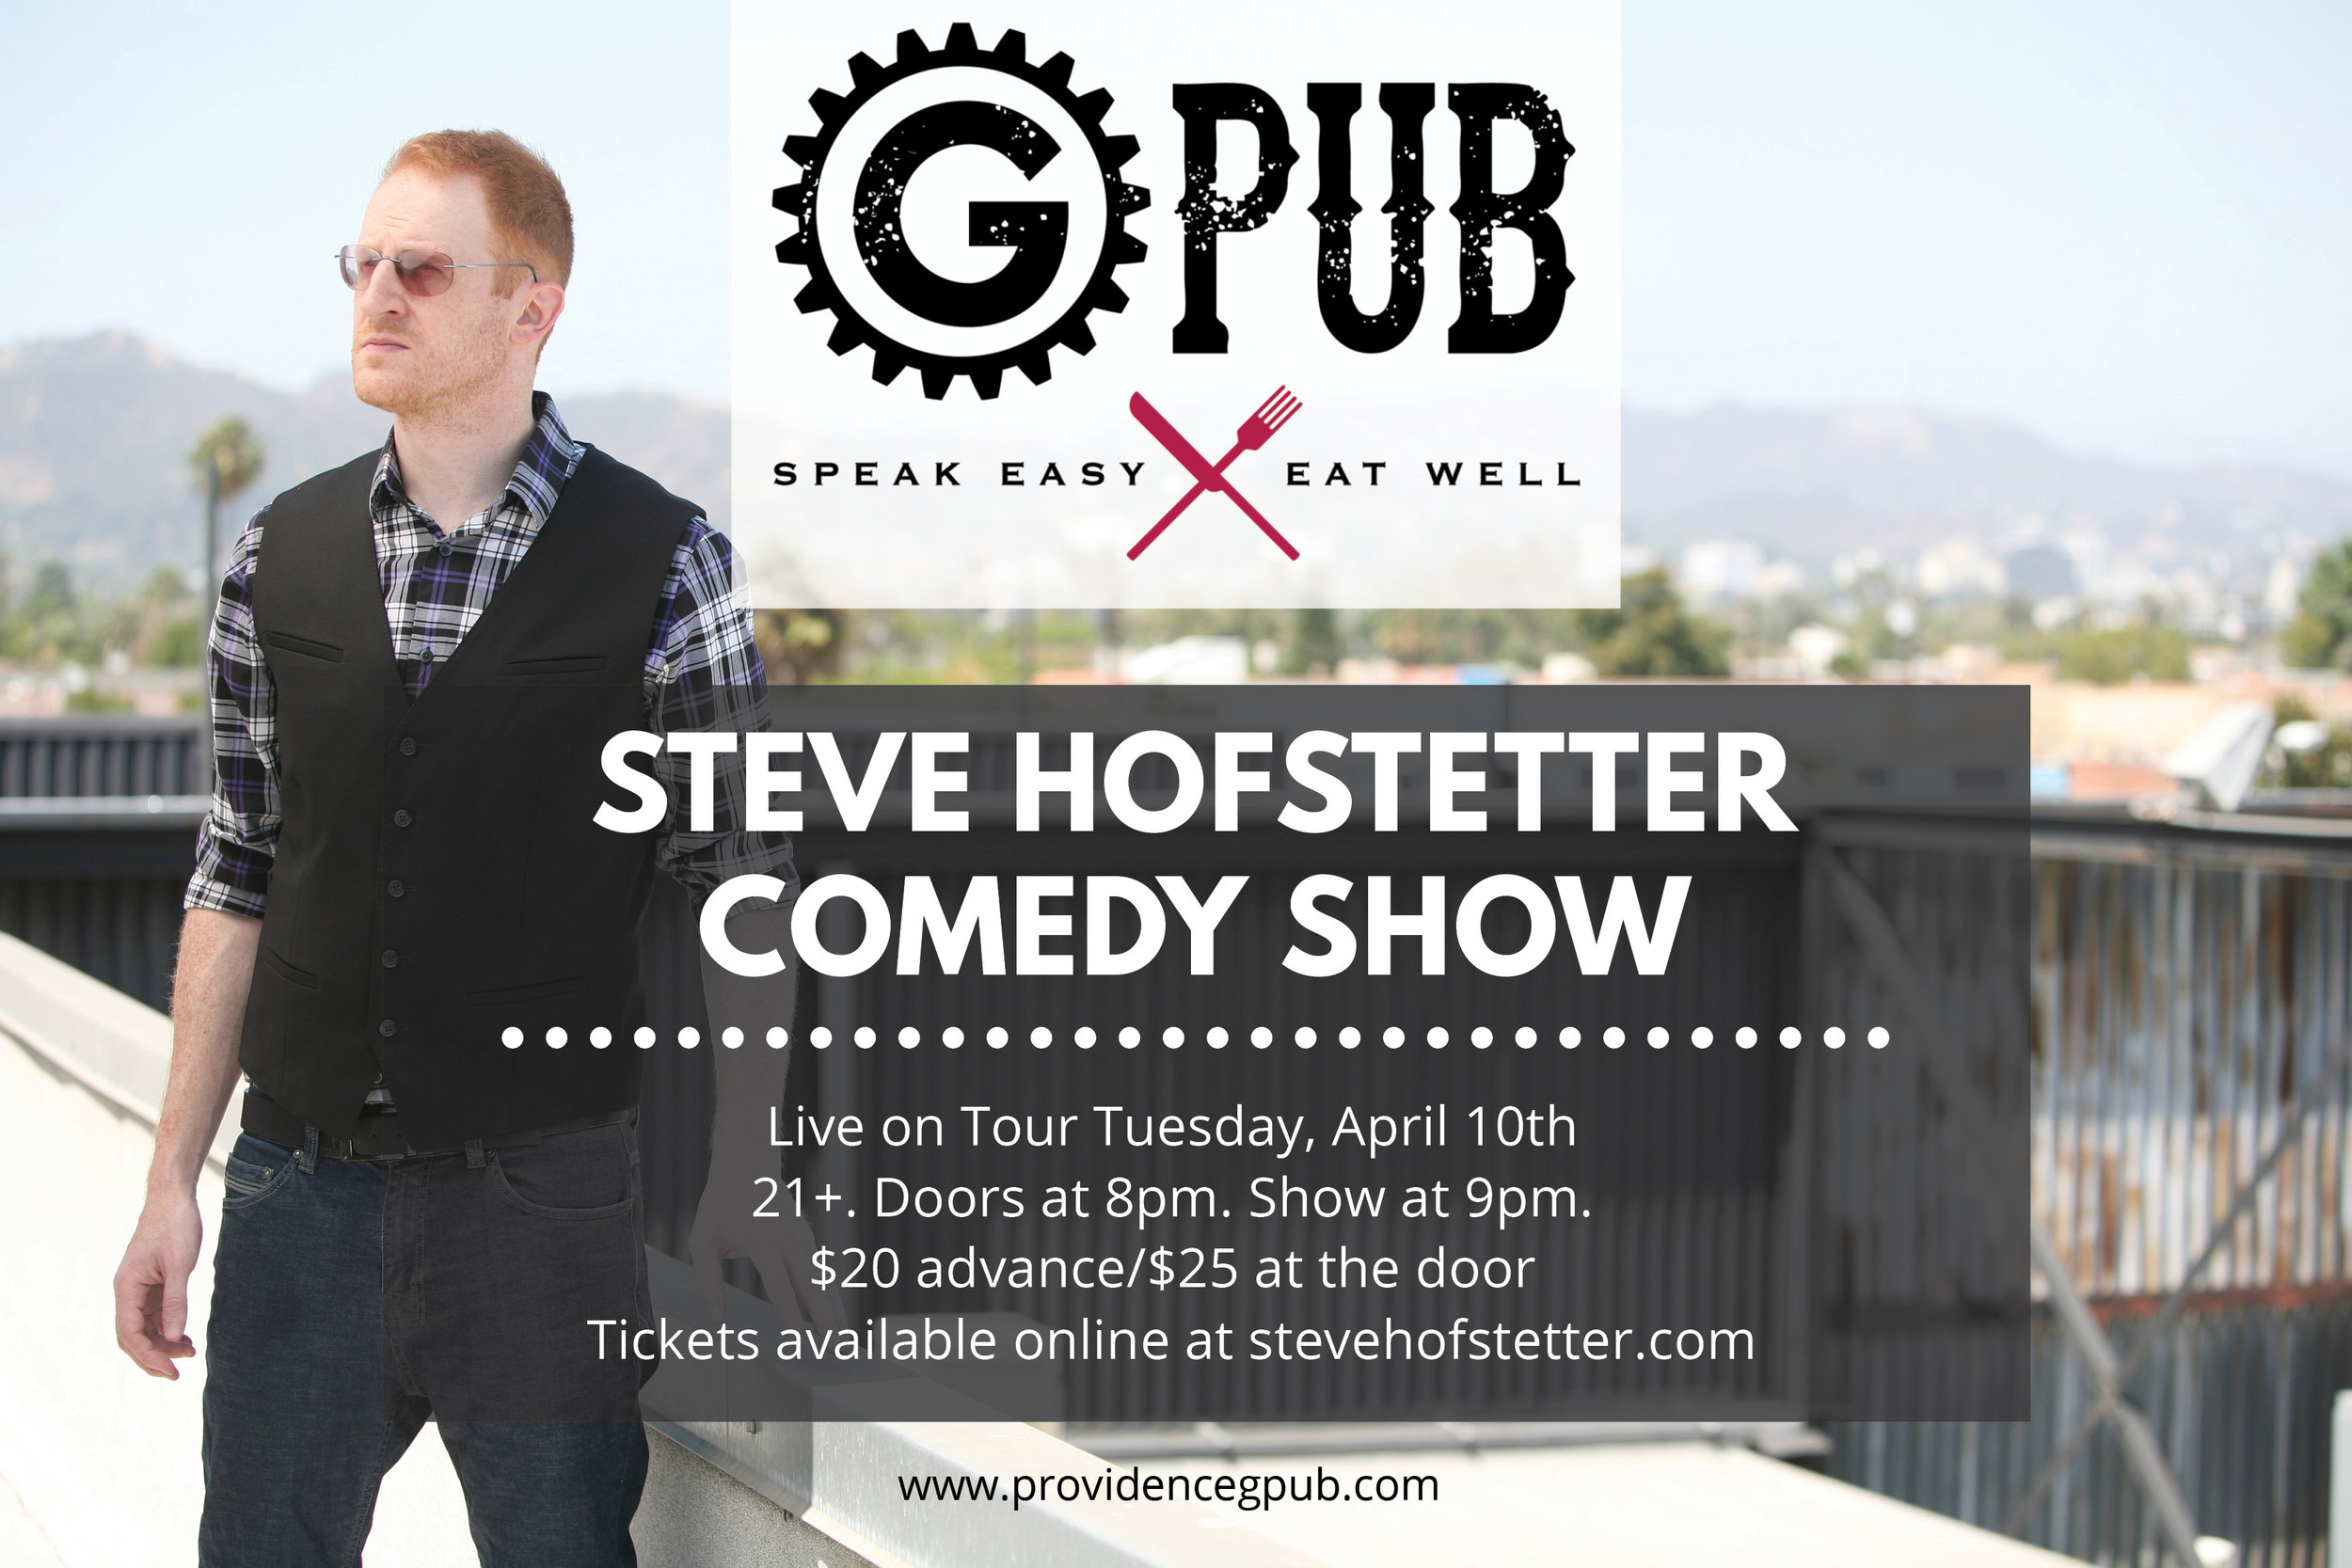 Steve Hofstetter comedy show vista.jpg